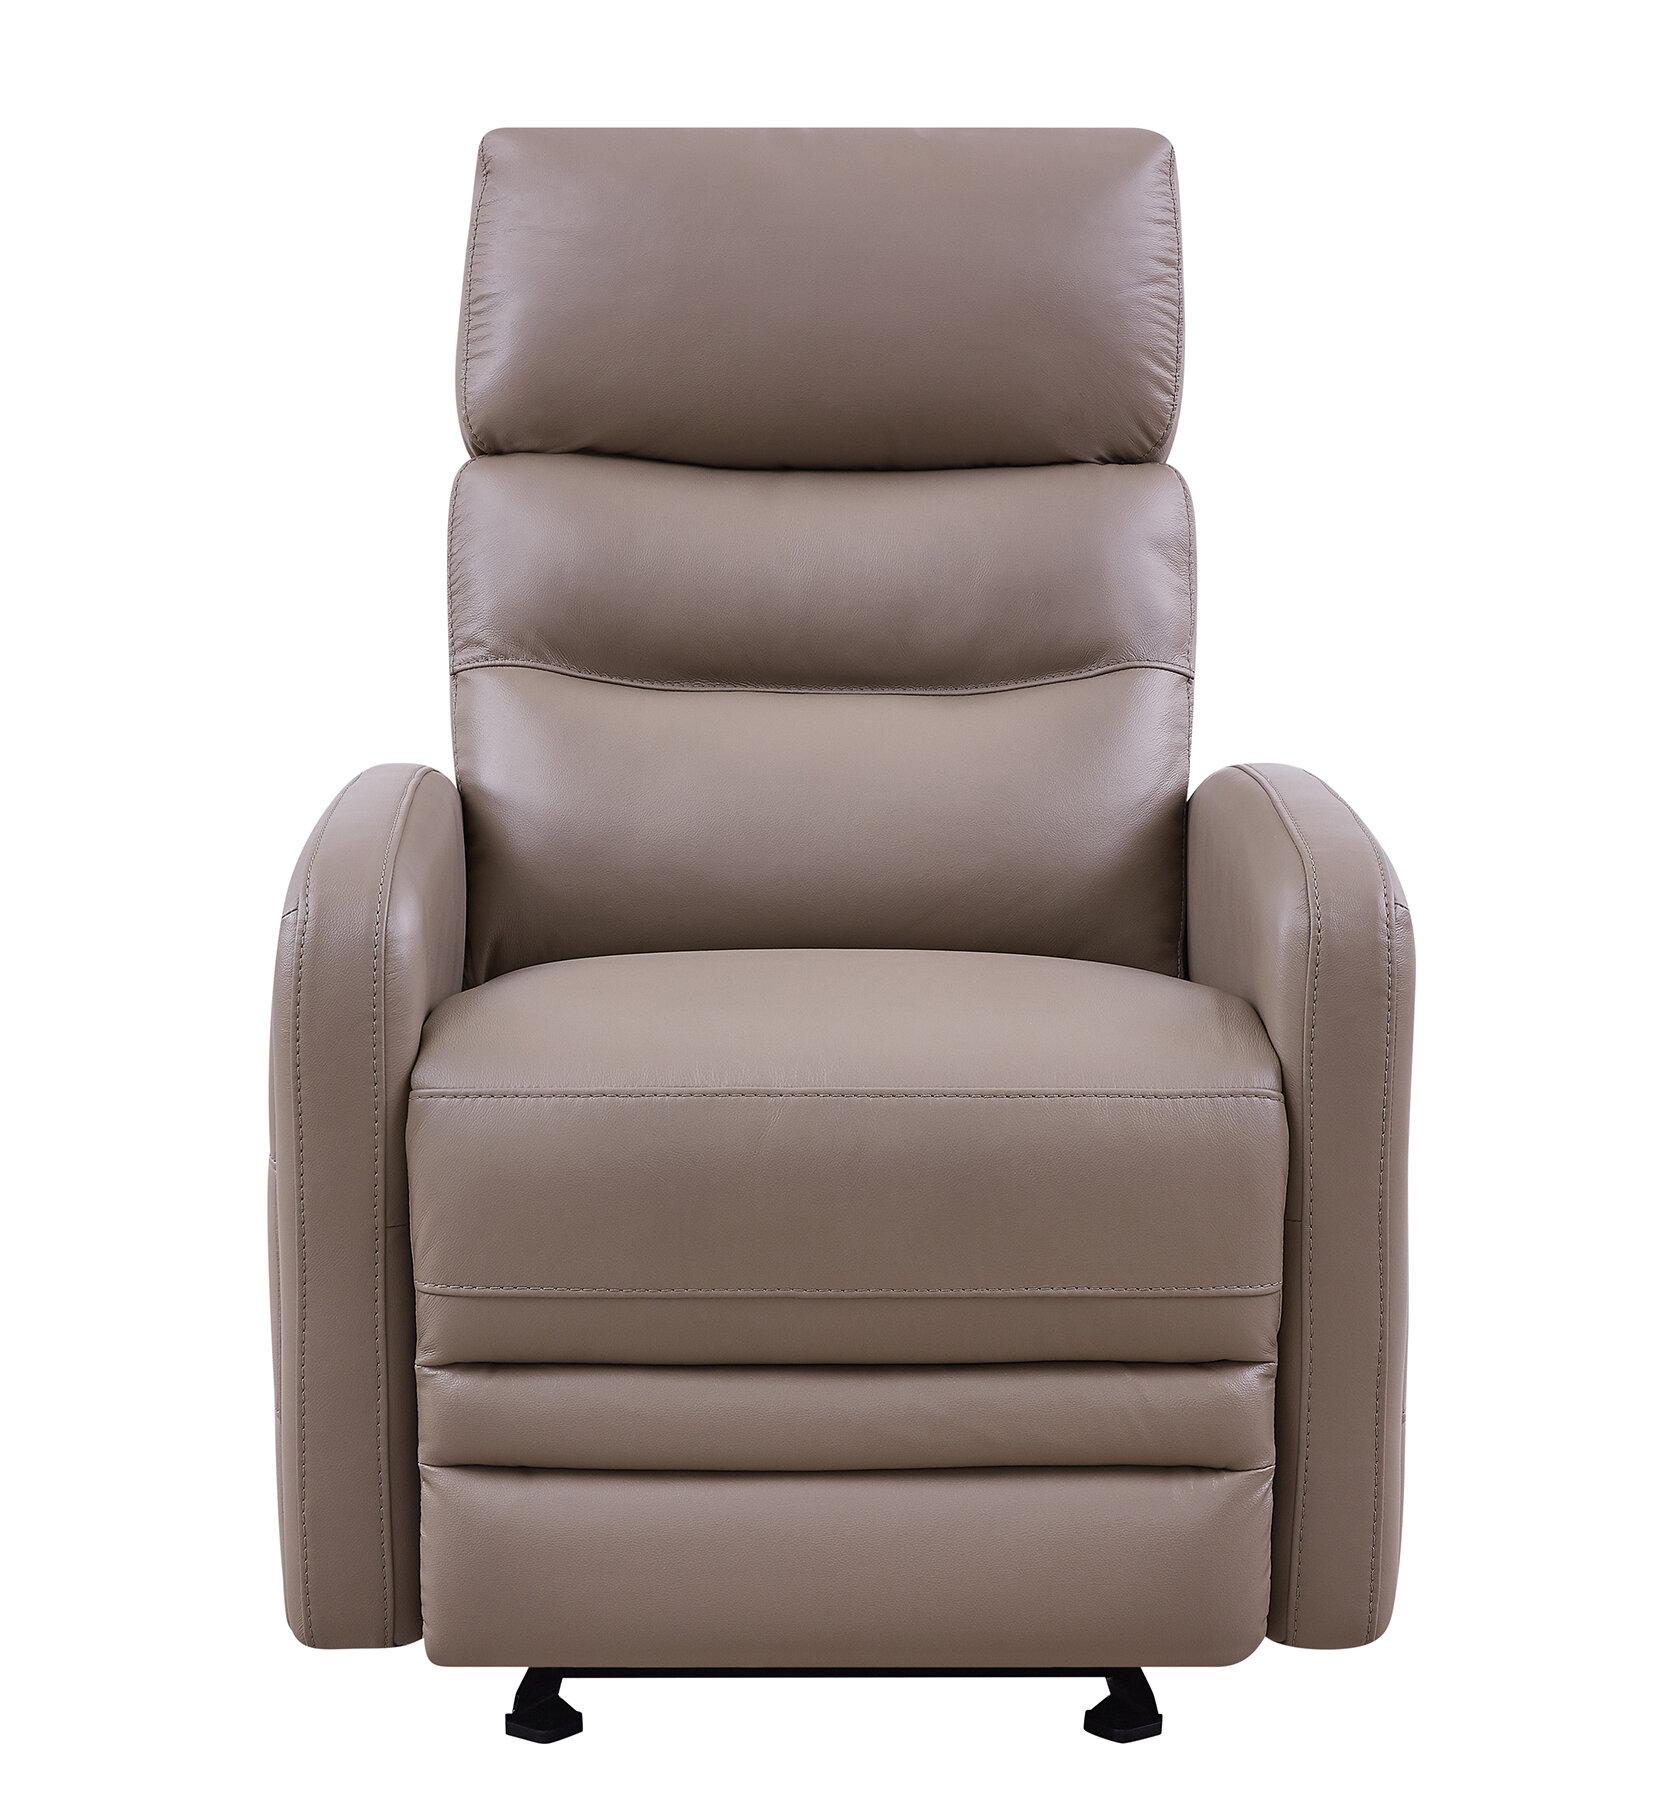 Sensational Goodlow Contemporary Leather Power Recliner Machost Co Dining Chair Design Ideas Machostcouk